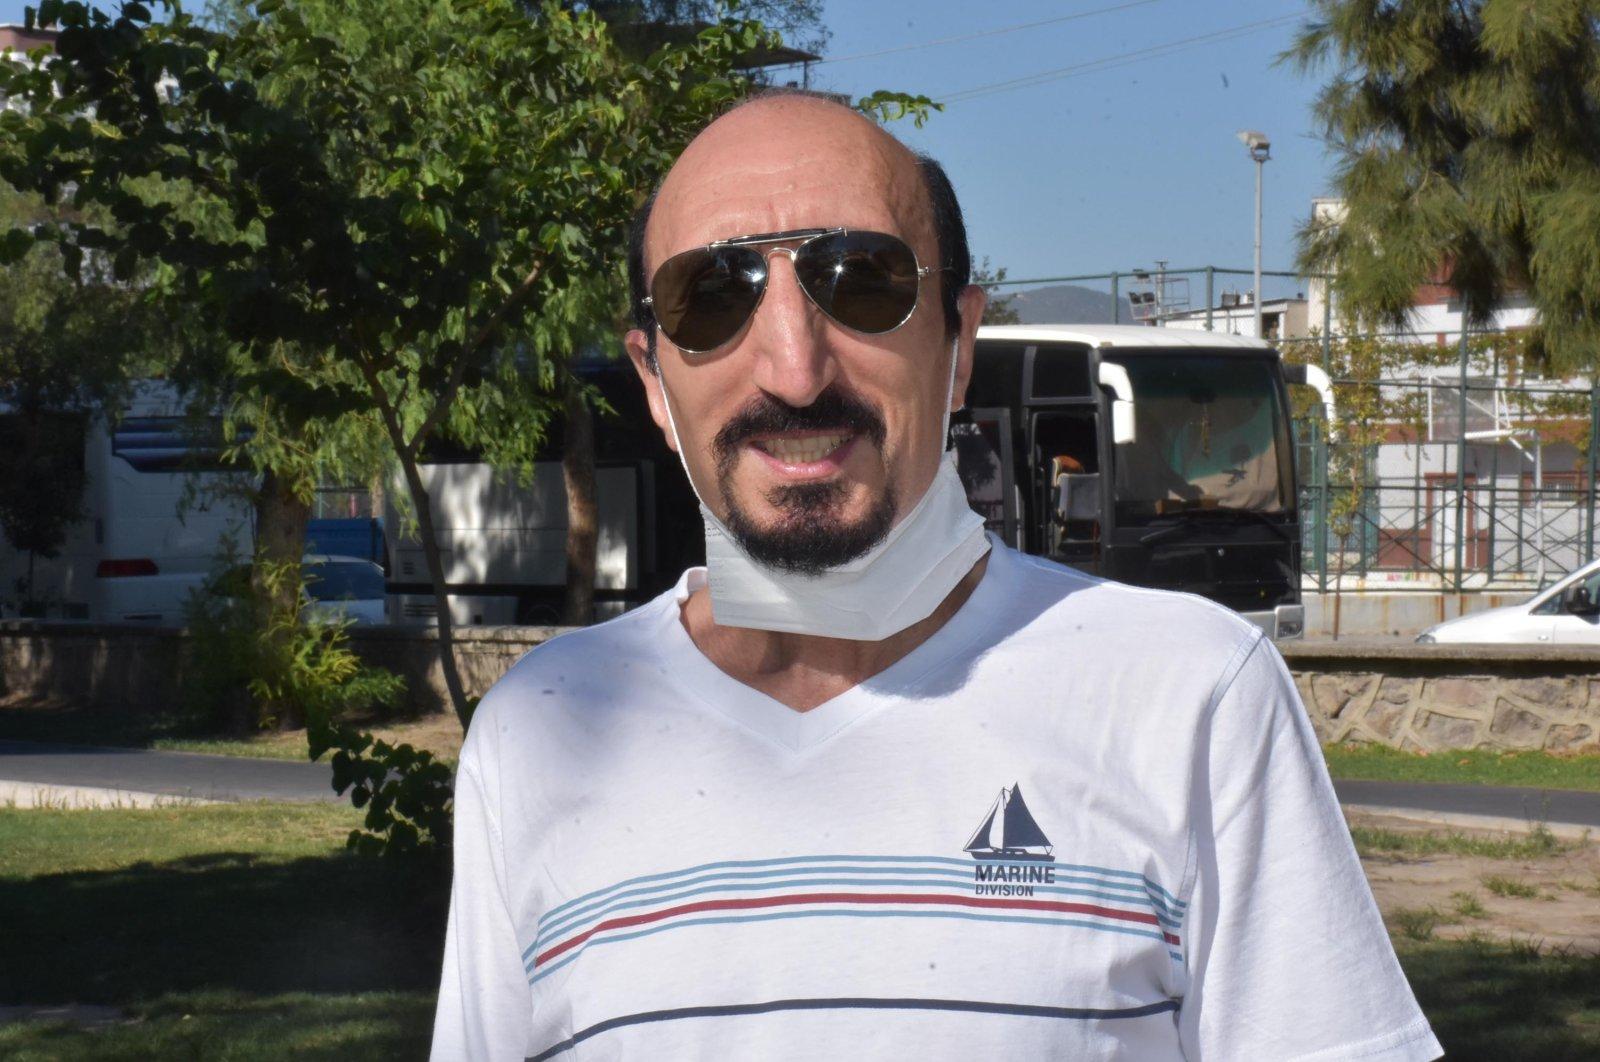 Mahir Çağrı, who rode a wave of popularity in 1999, is seen here in his hometown İzmir, western Turkey, Sept. 13, 2020. (DHA Photo)